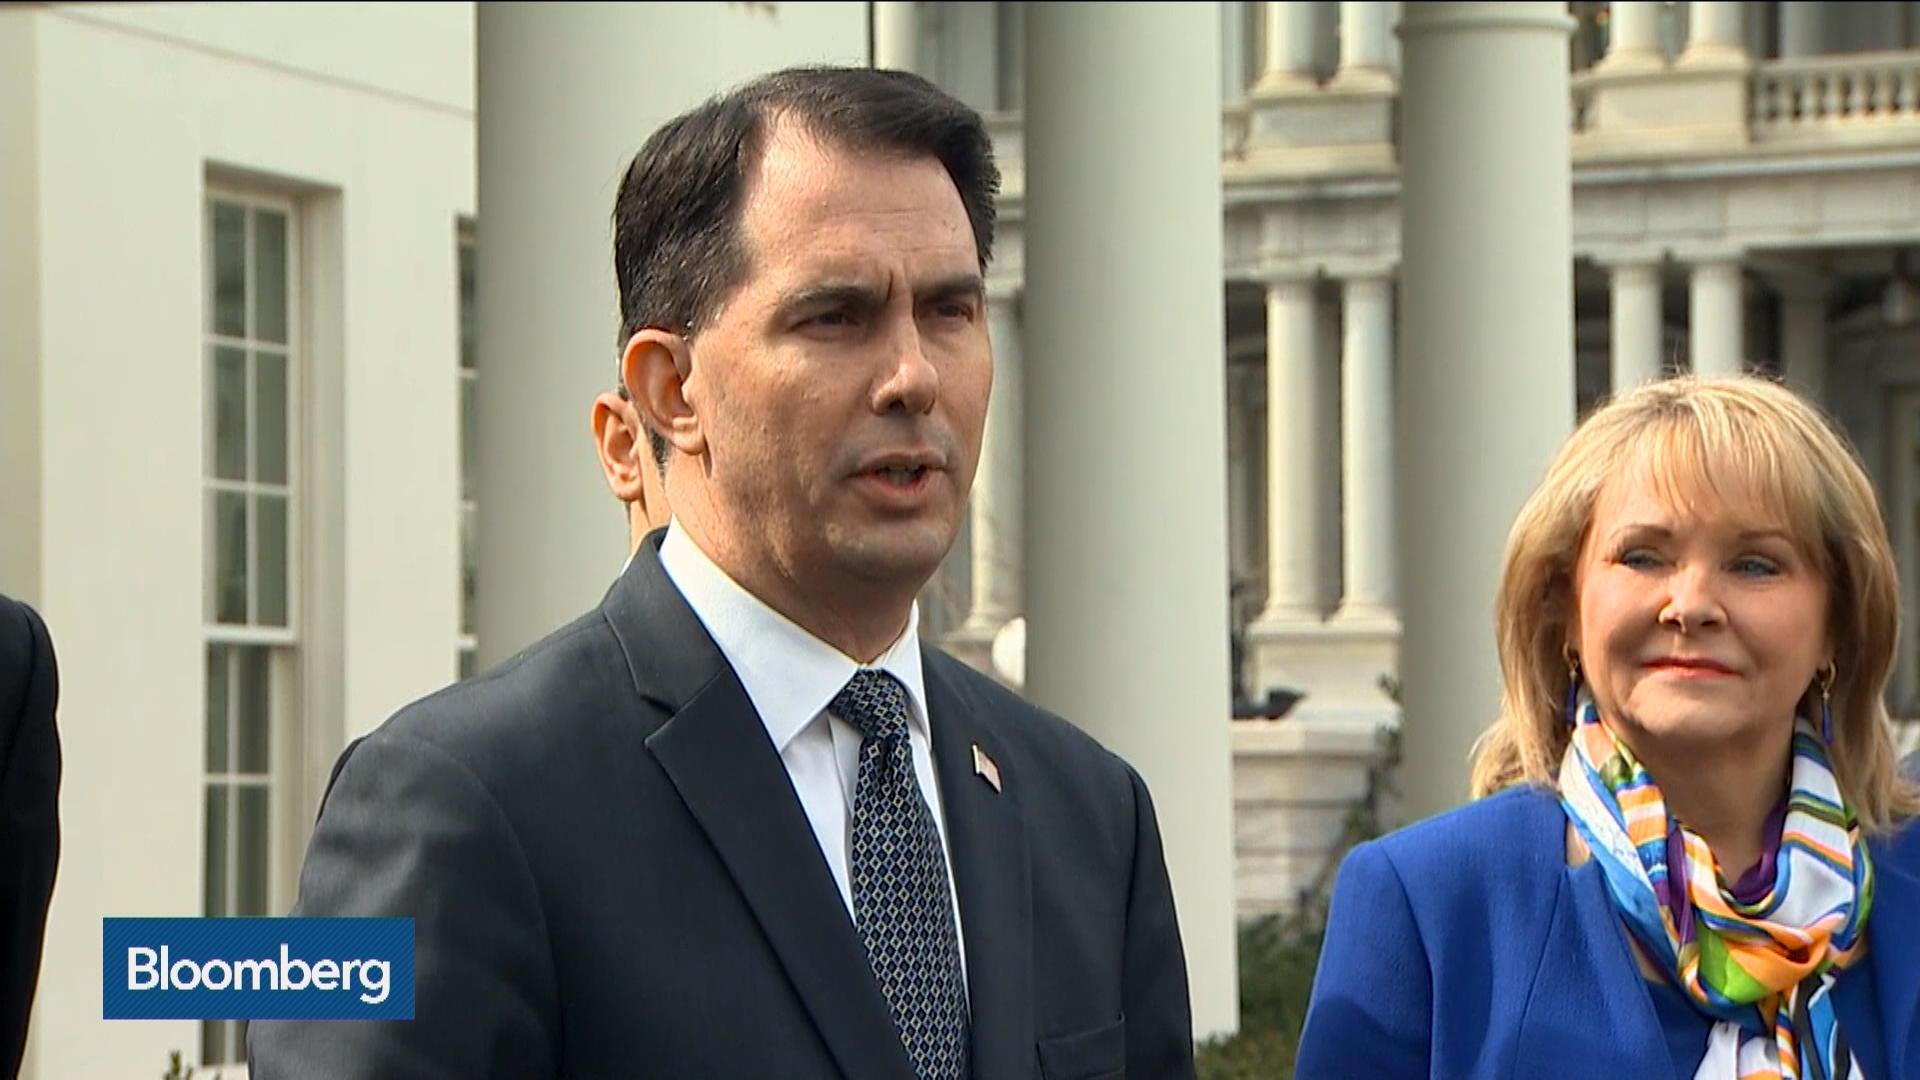 Wisconsin Gov. Scott Walker Says Obamacare Is a Mess